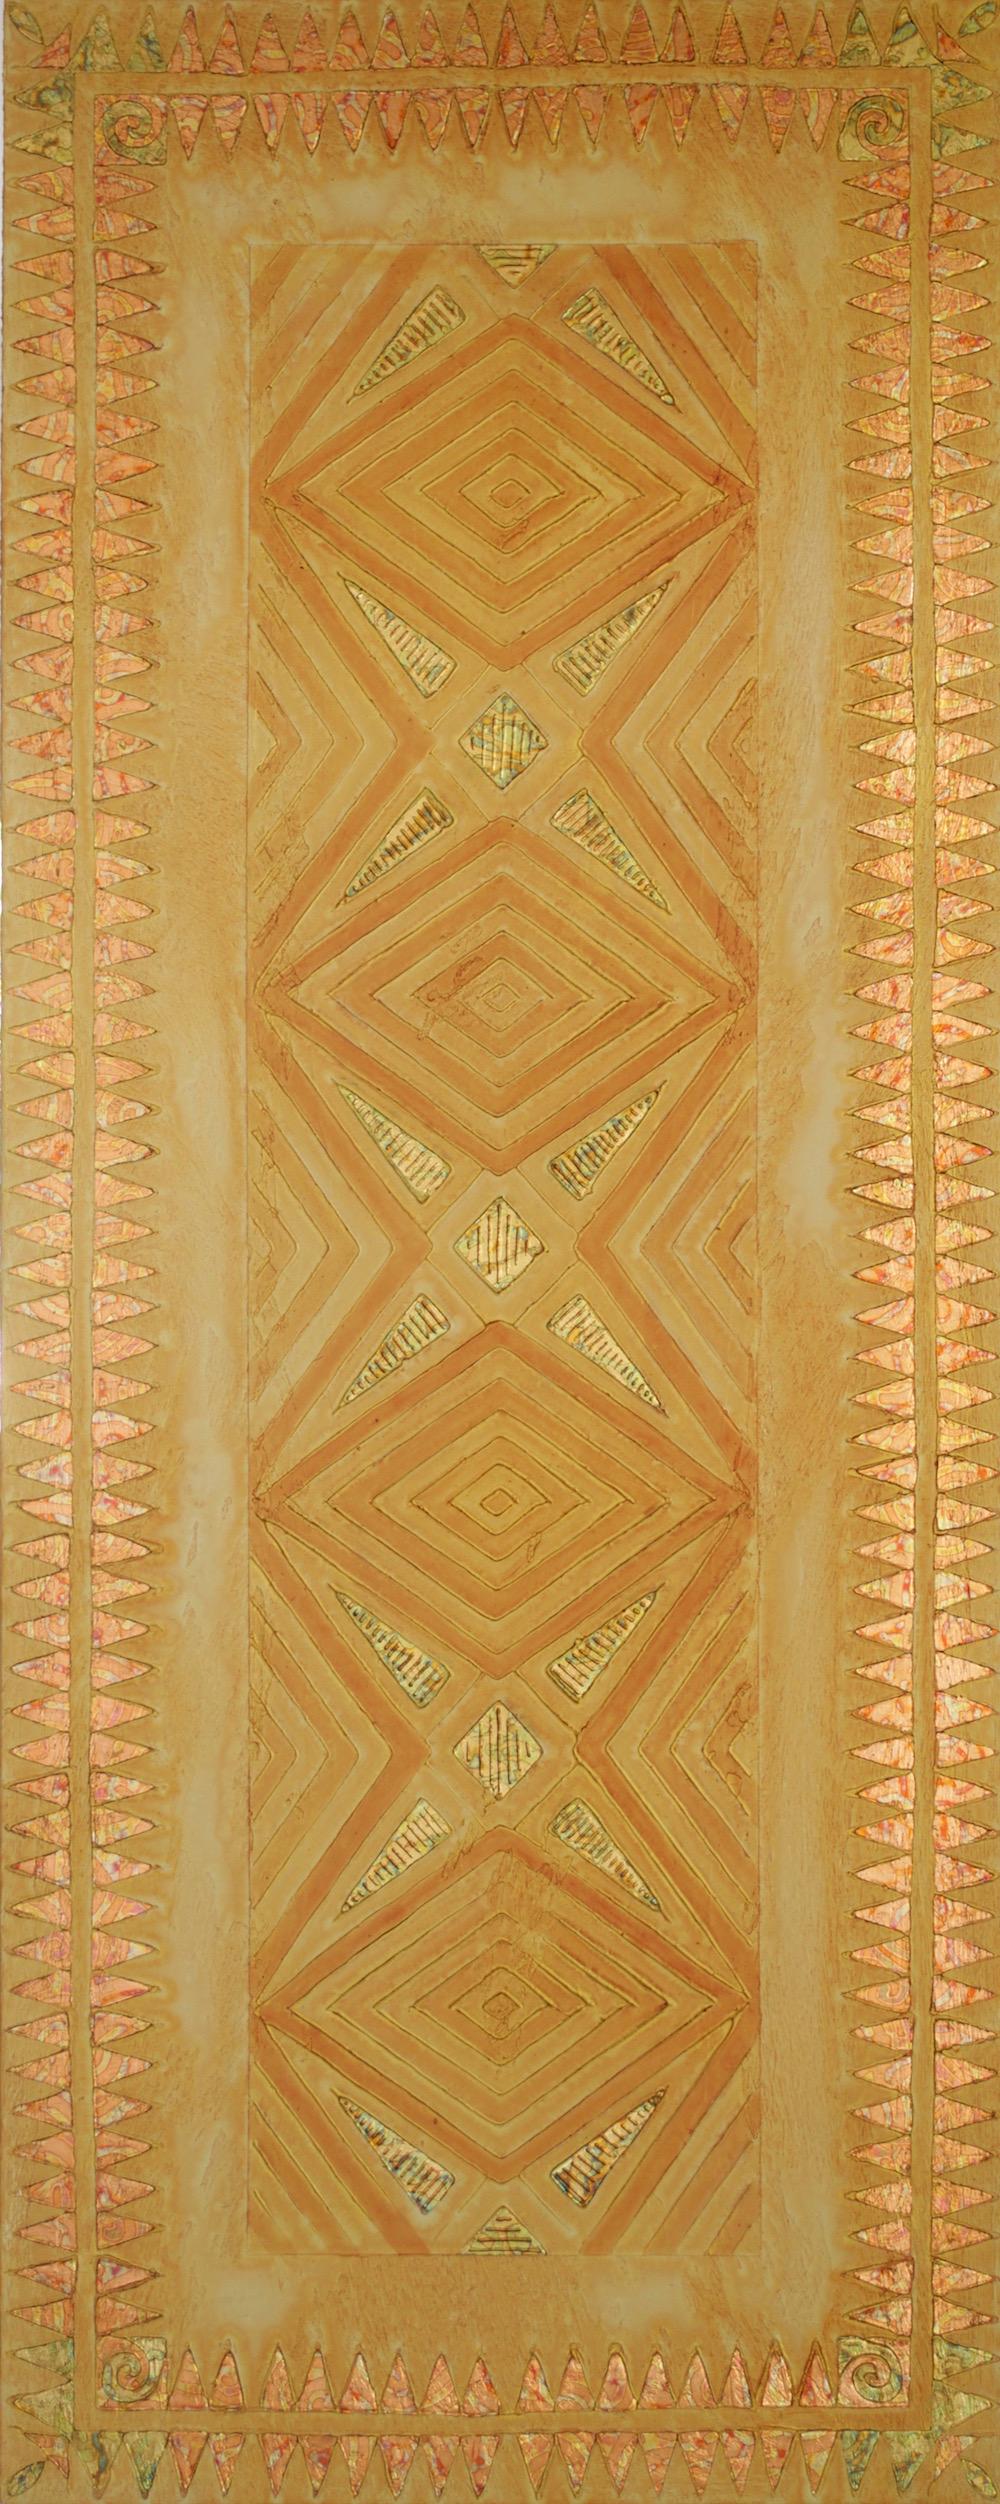 "Manawale'a Hoku (Generous Heart Star) 24"" x 60"" x 2"" Acrylic, oil & gold leaf on archival board"